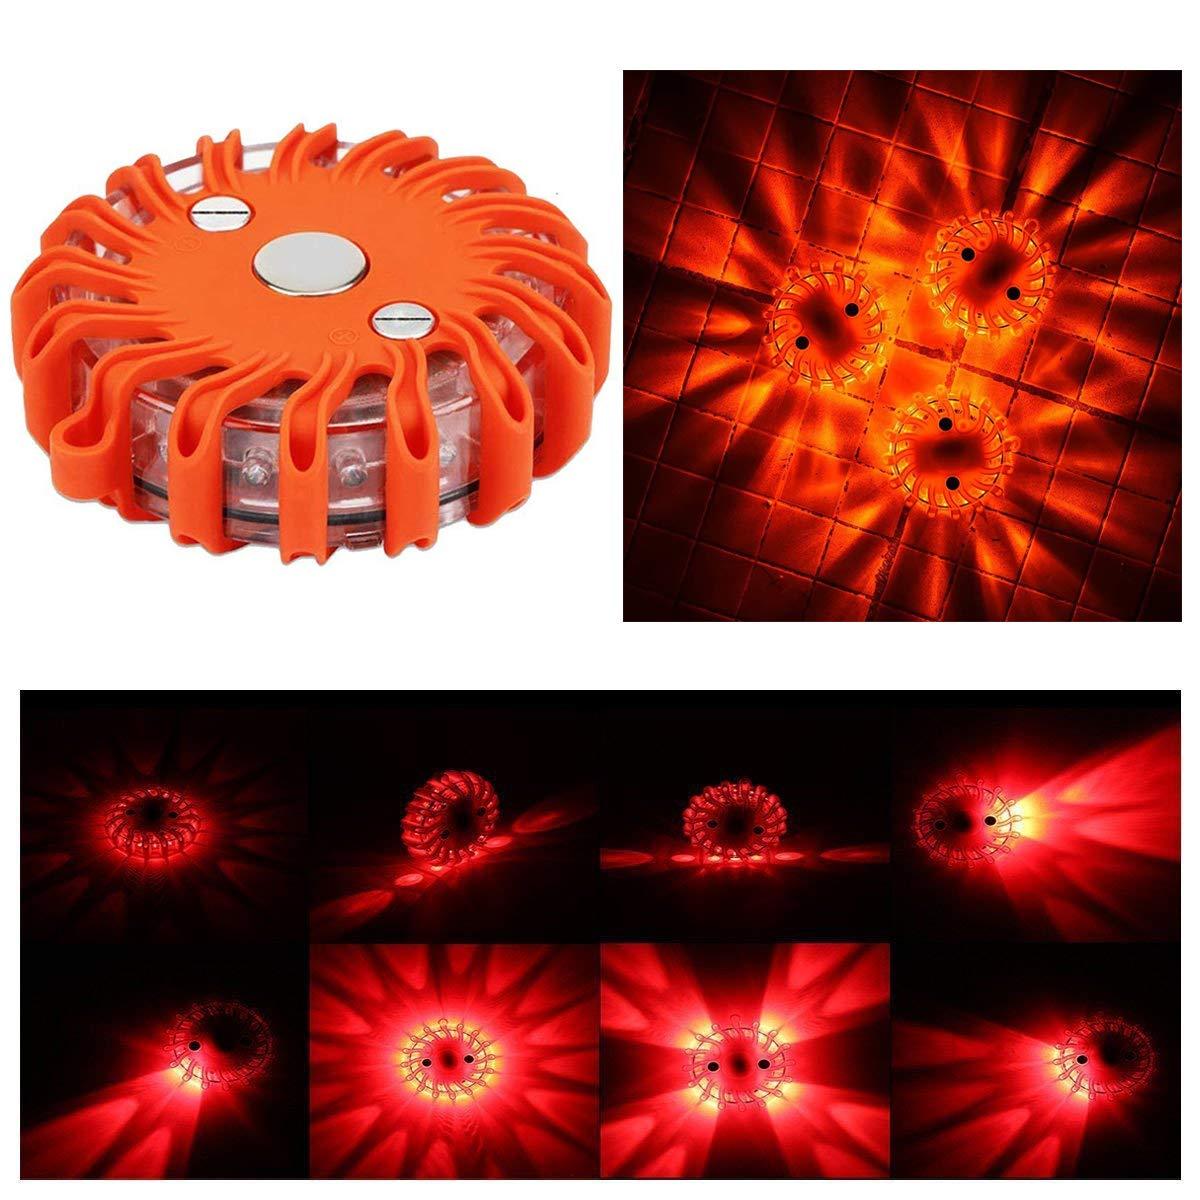 ProPlus 540322 LED Warnblitzer Warnleuchte Blitz Leuchte Rescue Flare ROT 16 LED